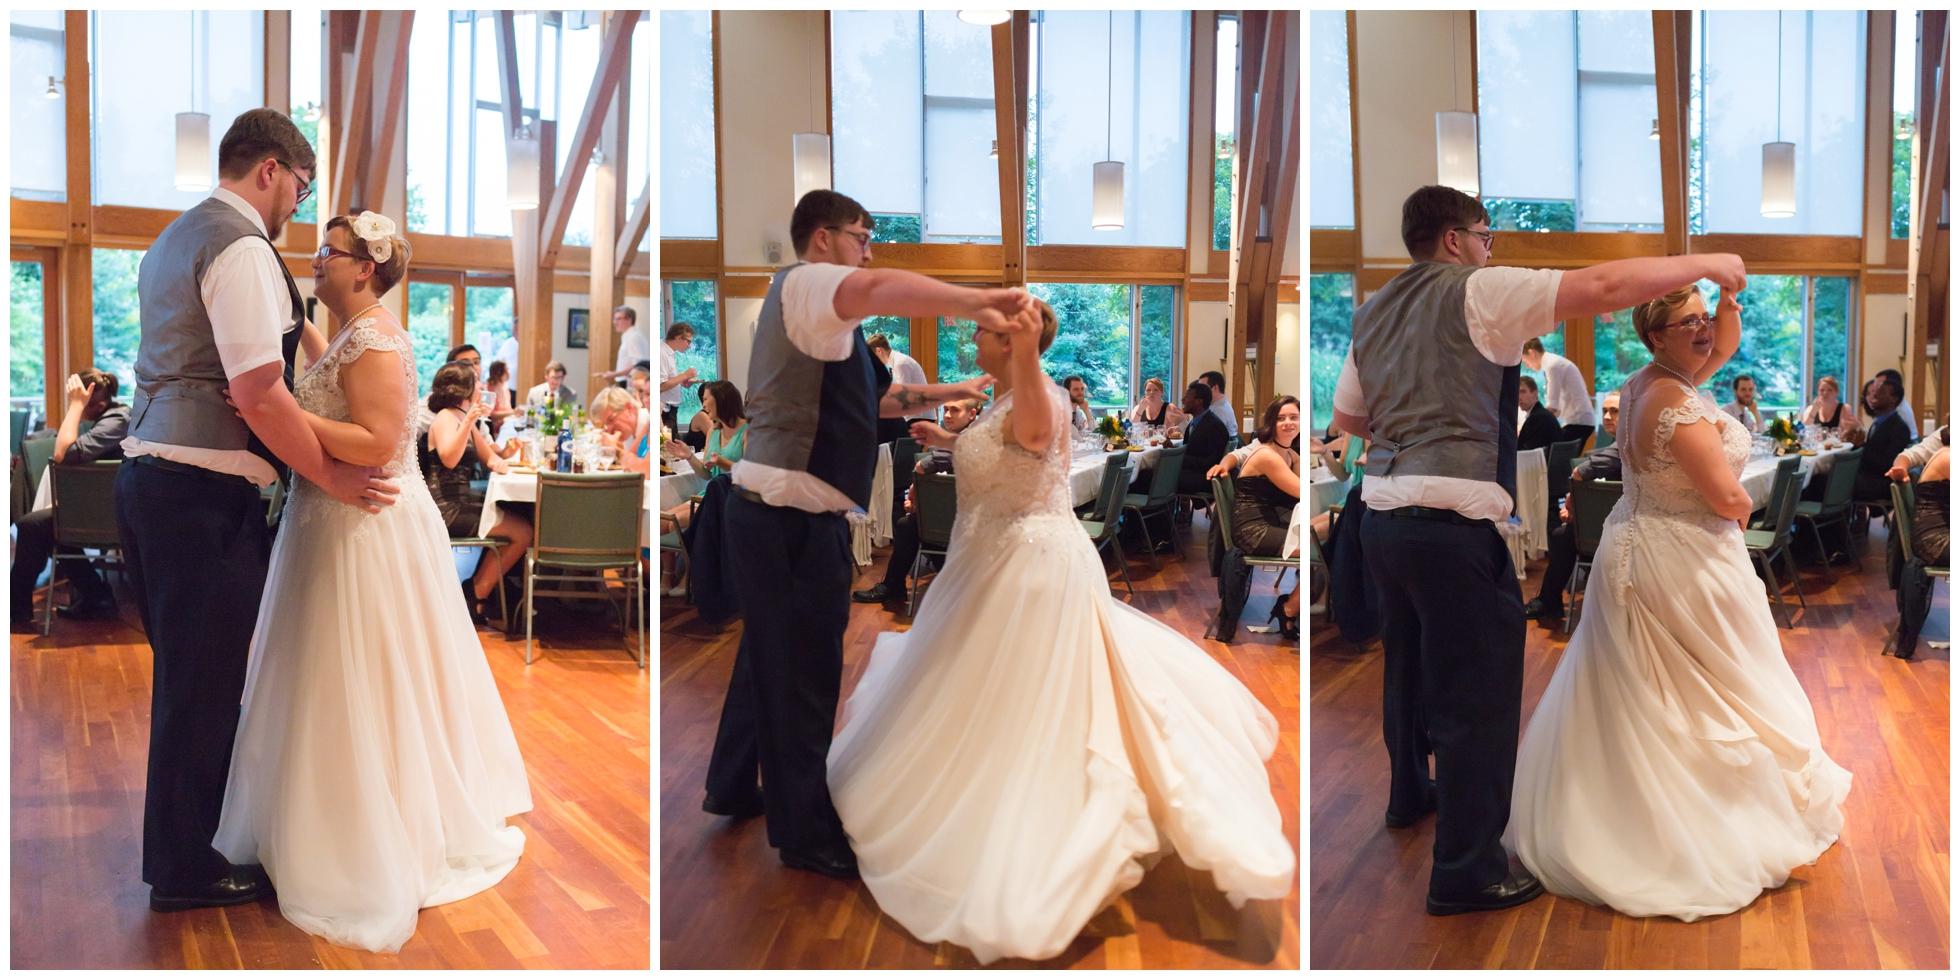 Toronto Wedding Chris Kate (Selena Phillips-Boyle)_0036.jpg